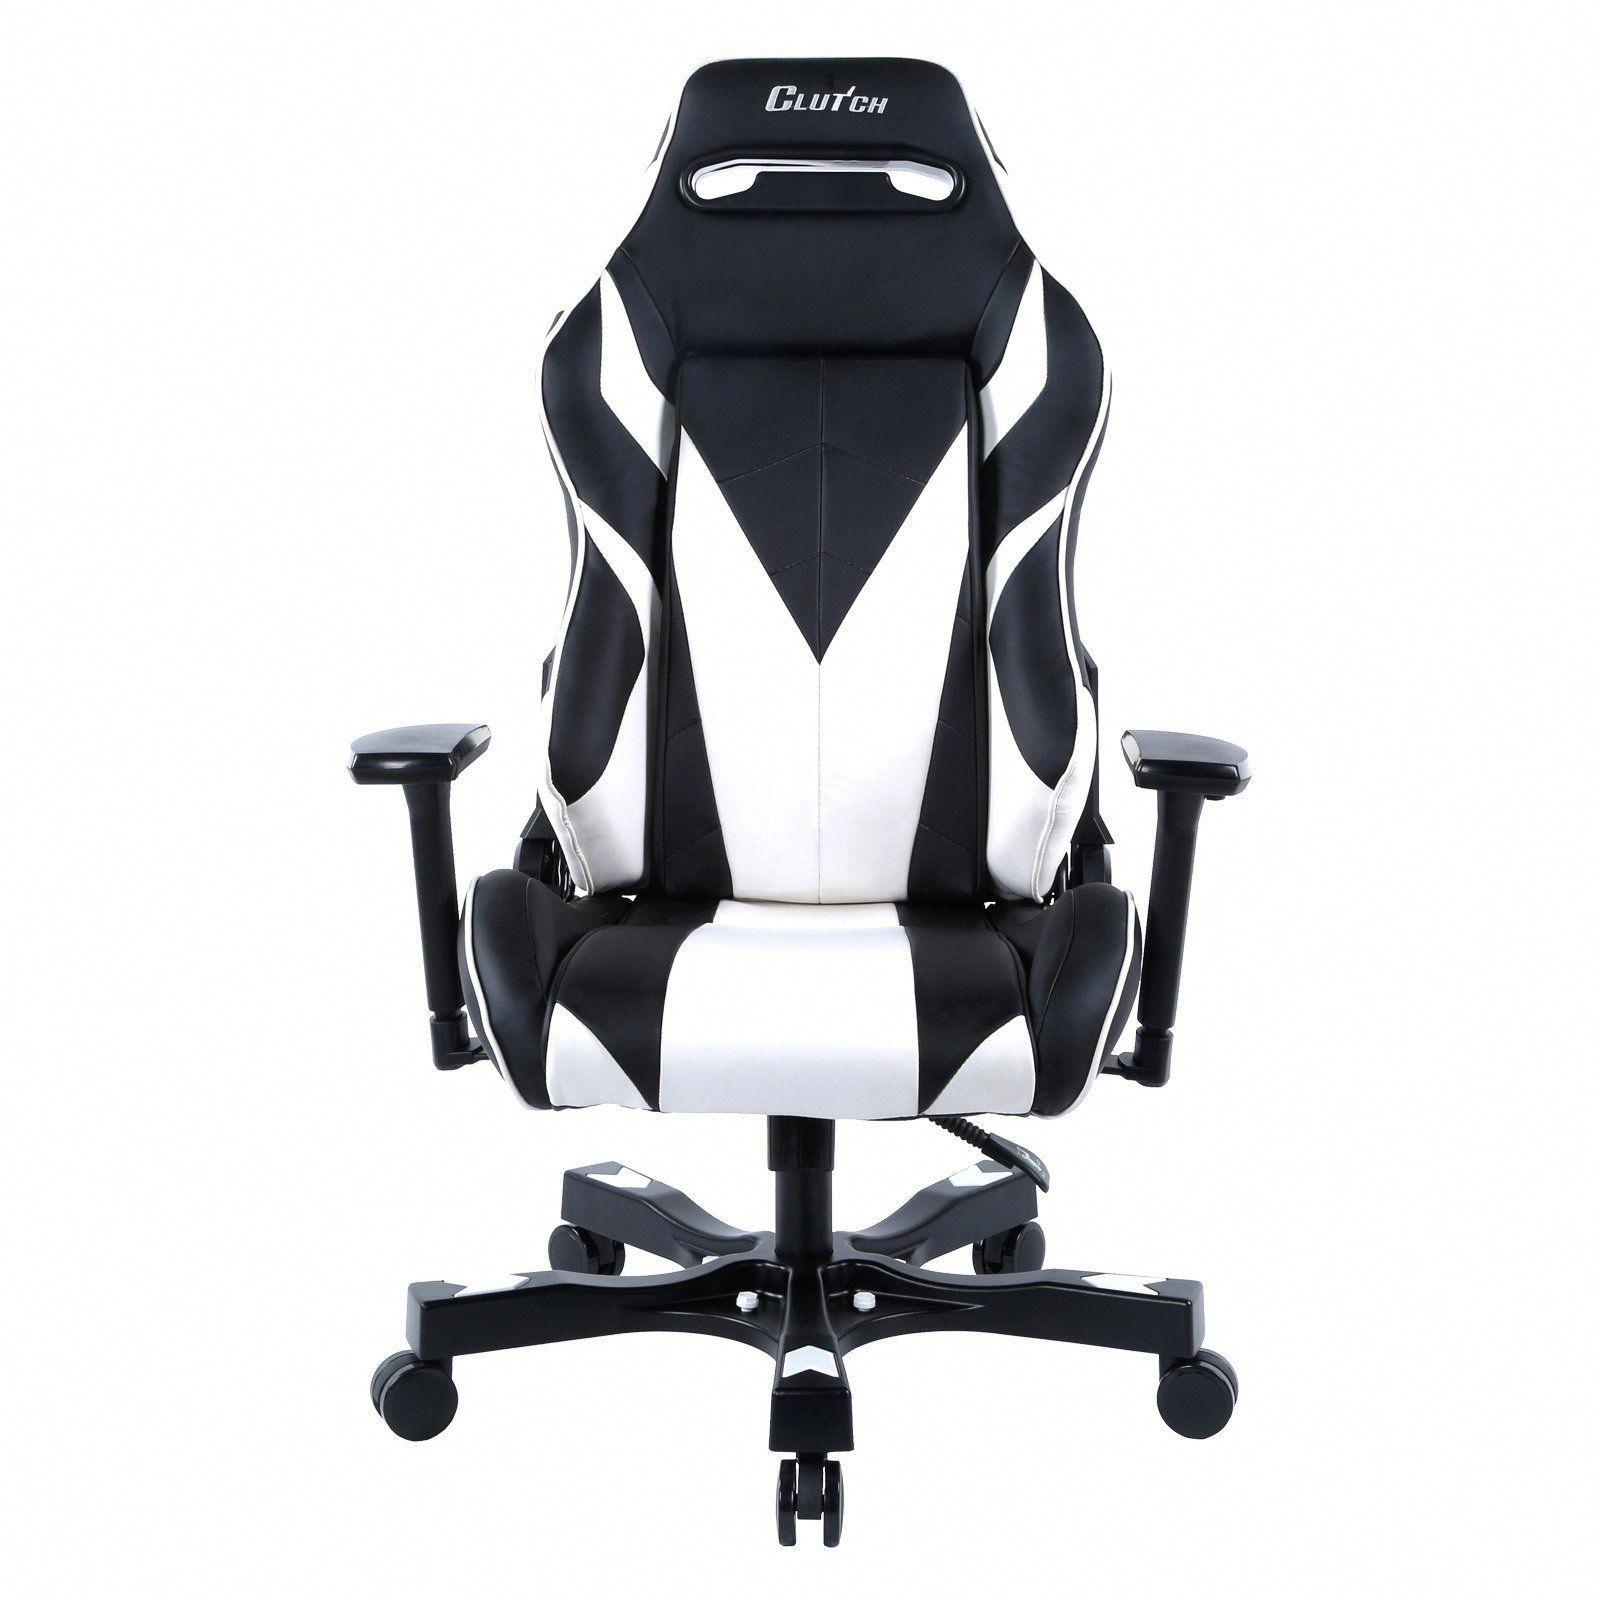 xp series gaming chair setup